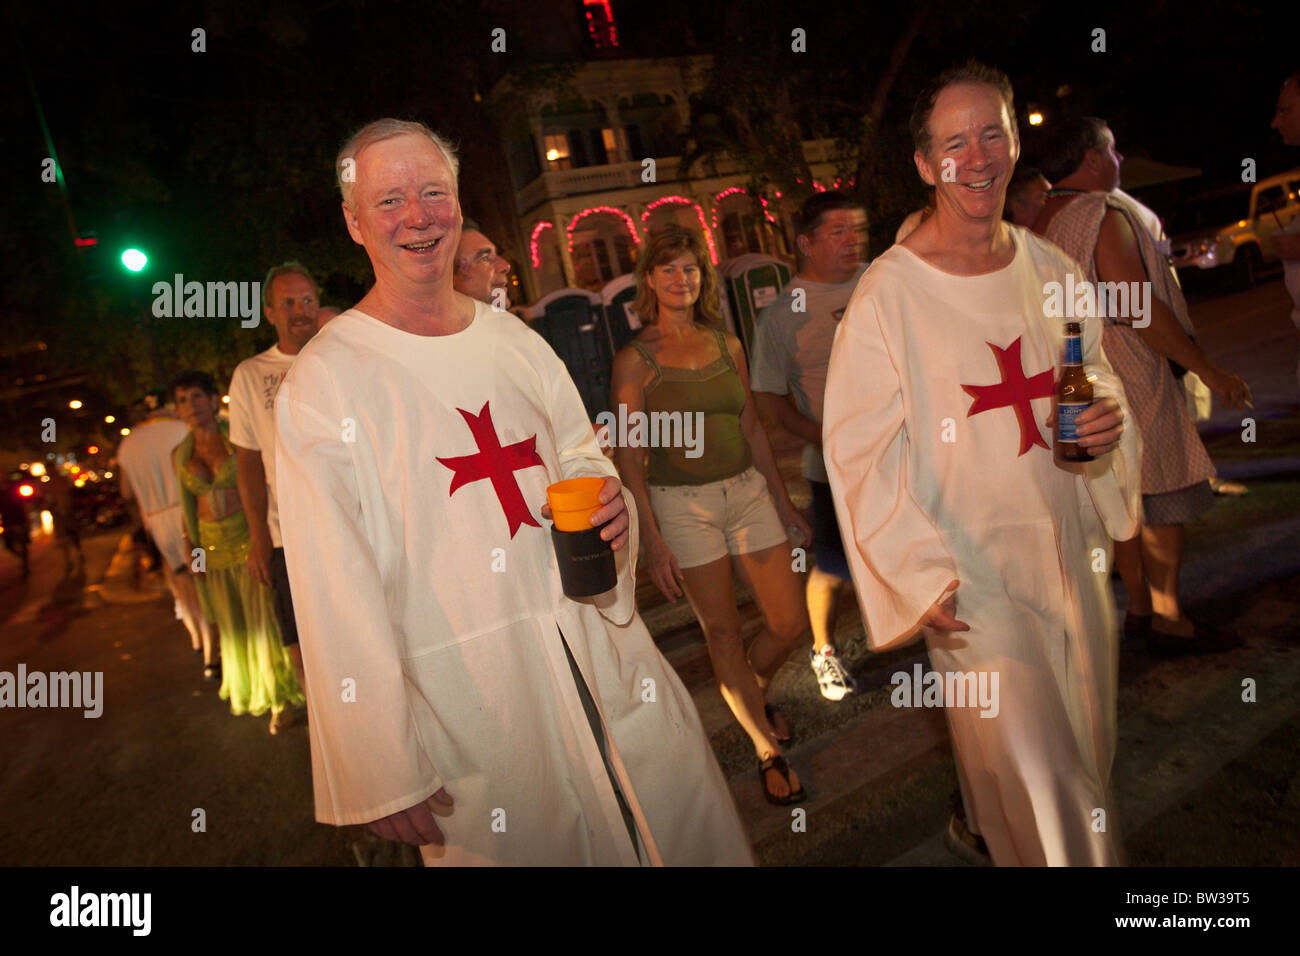 Costumed revelers during Fantasy Fest halloween parade in Key West, Florida. - Stock Image